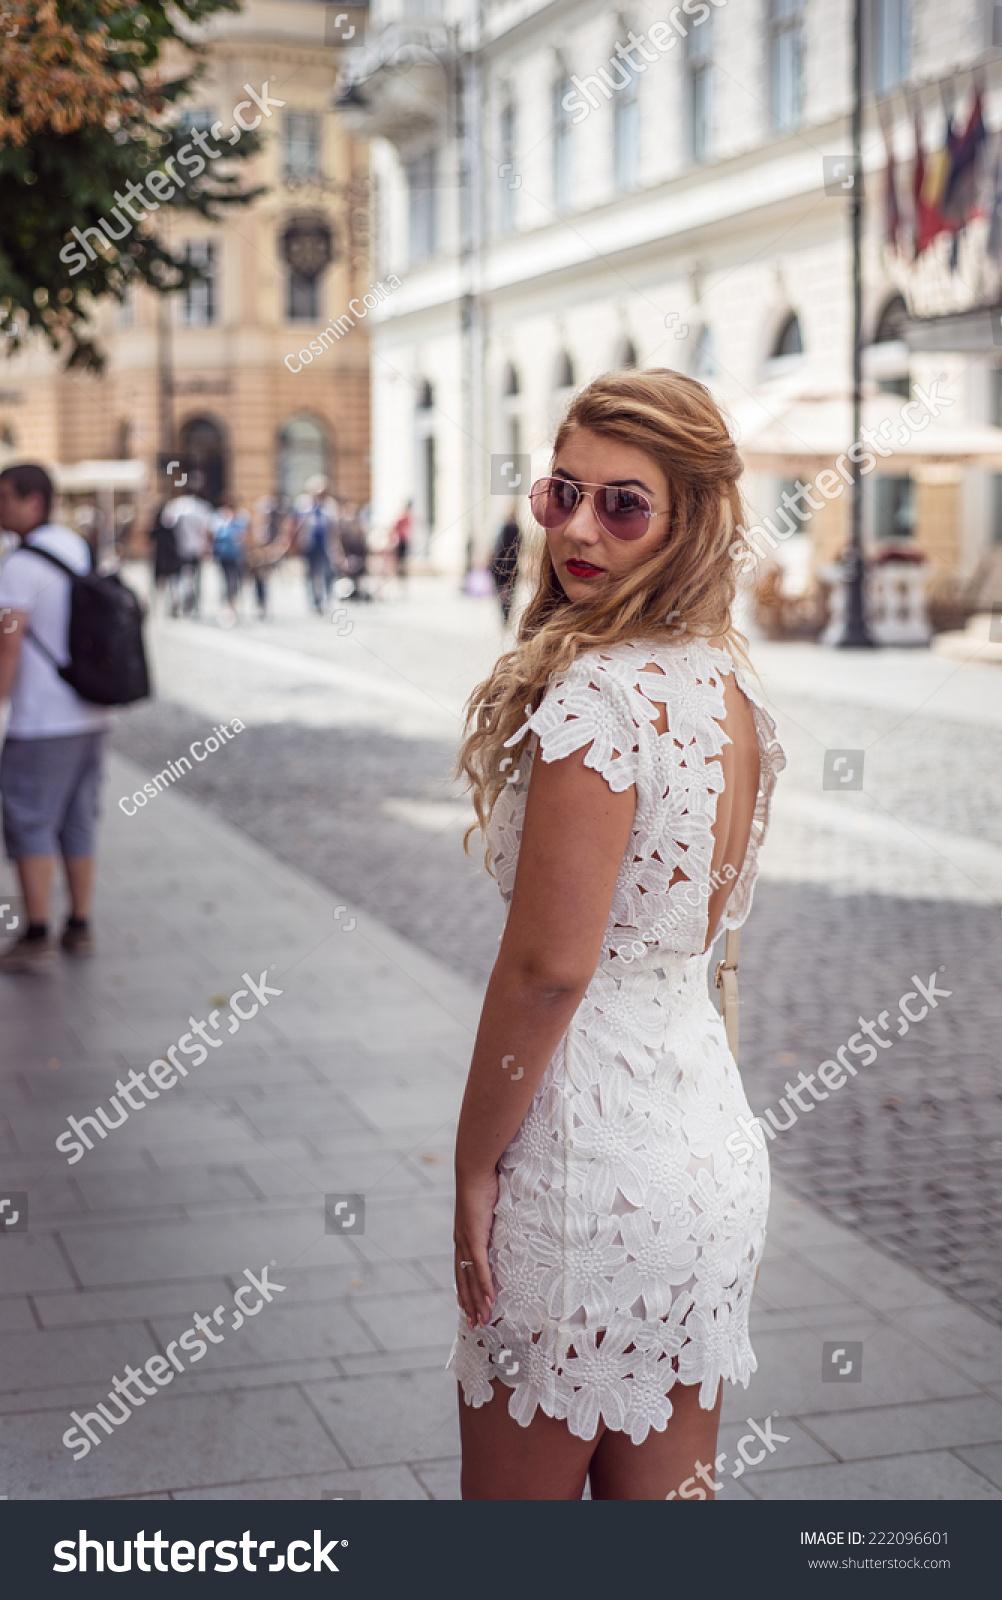 Glamorous Elegant Woman Backless White Dress Stock Photo 222096601 ...